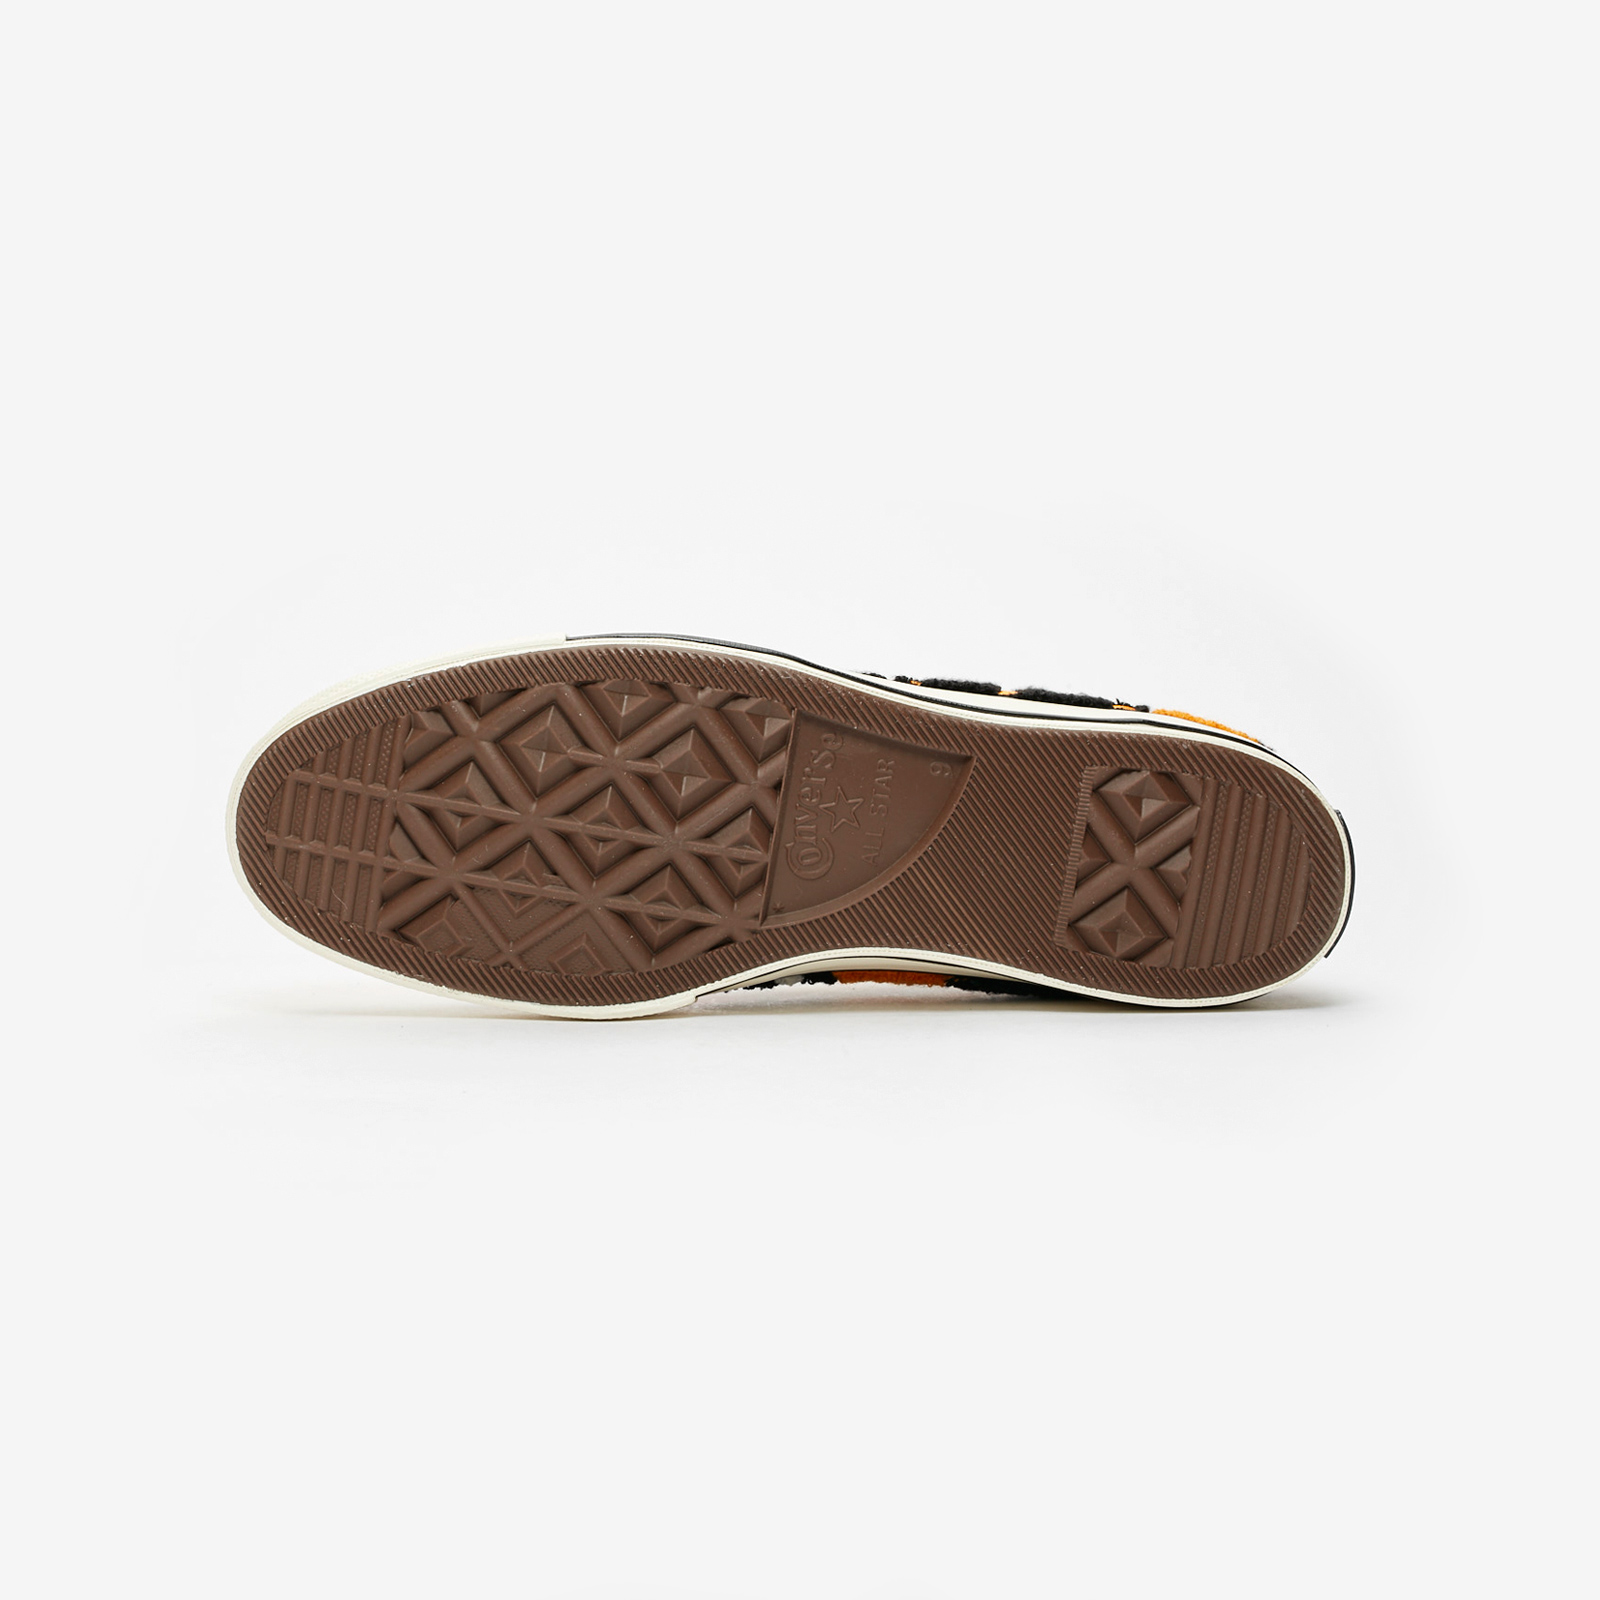 Converse Chuck Ox 70 x UNDFTD 162981c Sneakersnstuff